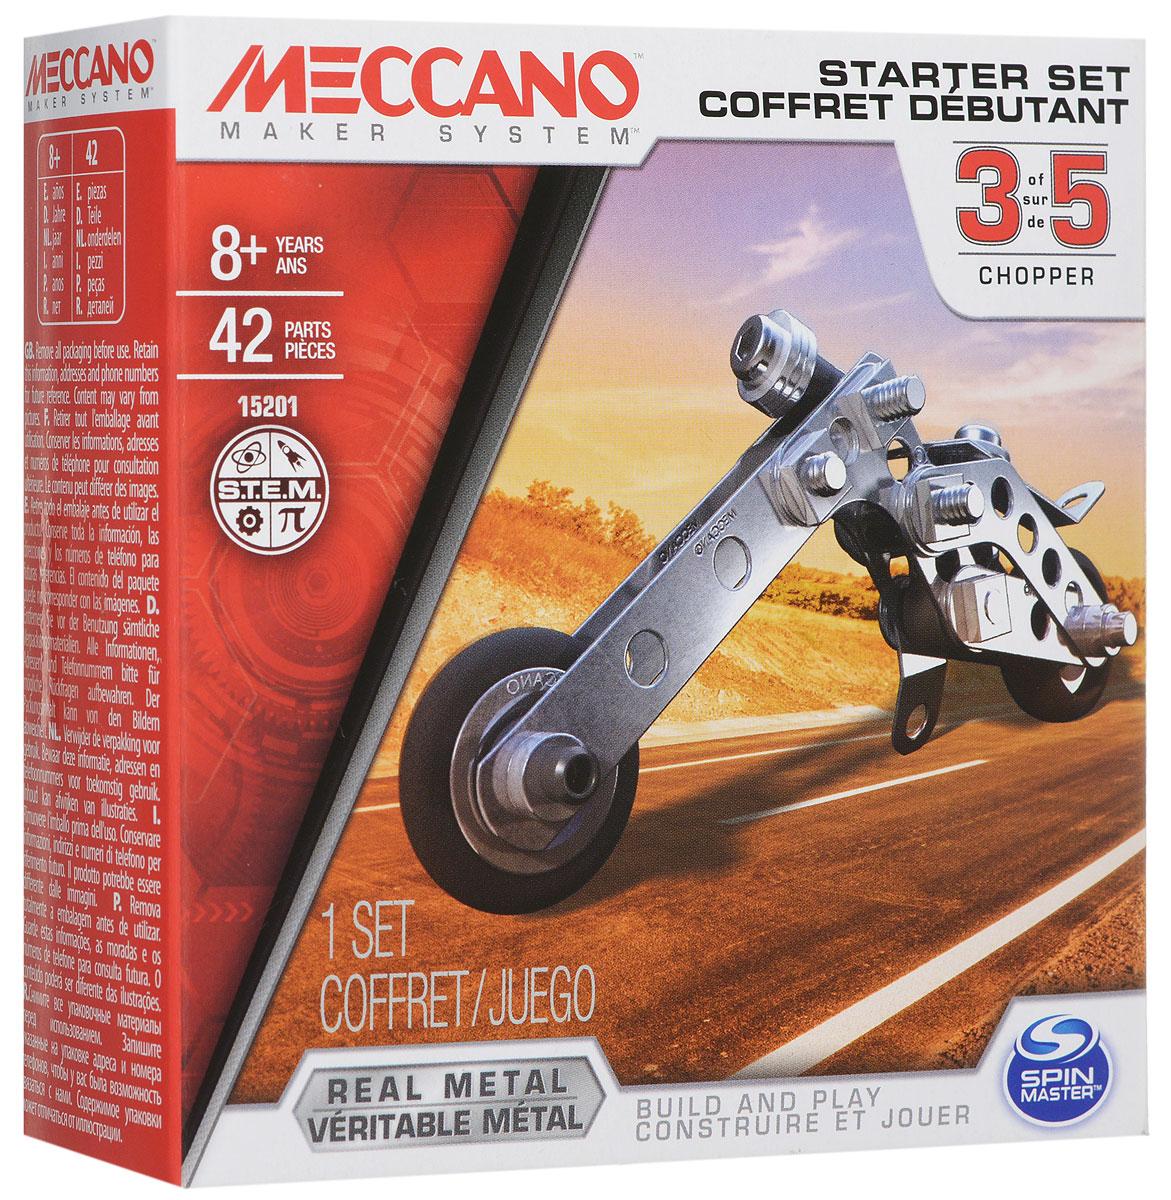 Meccano Конструктор Базовая модель 3 конструкторы meccano игрушка meccano гоночная машина р у 2 модели